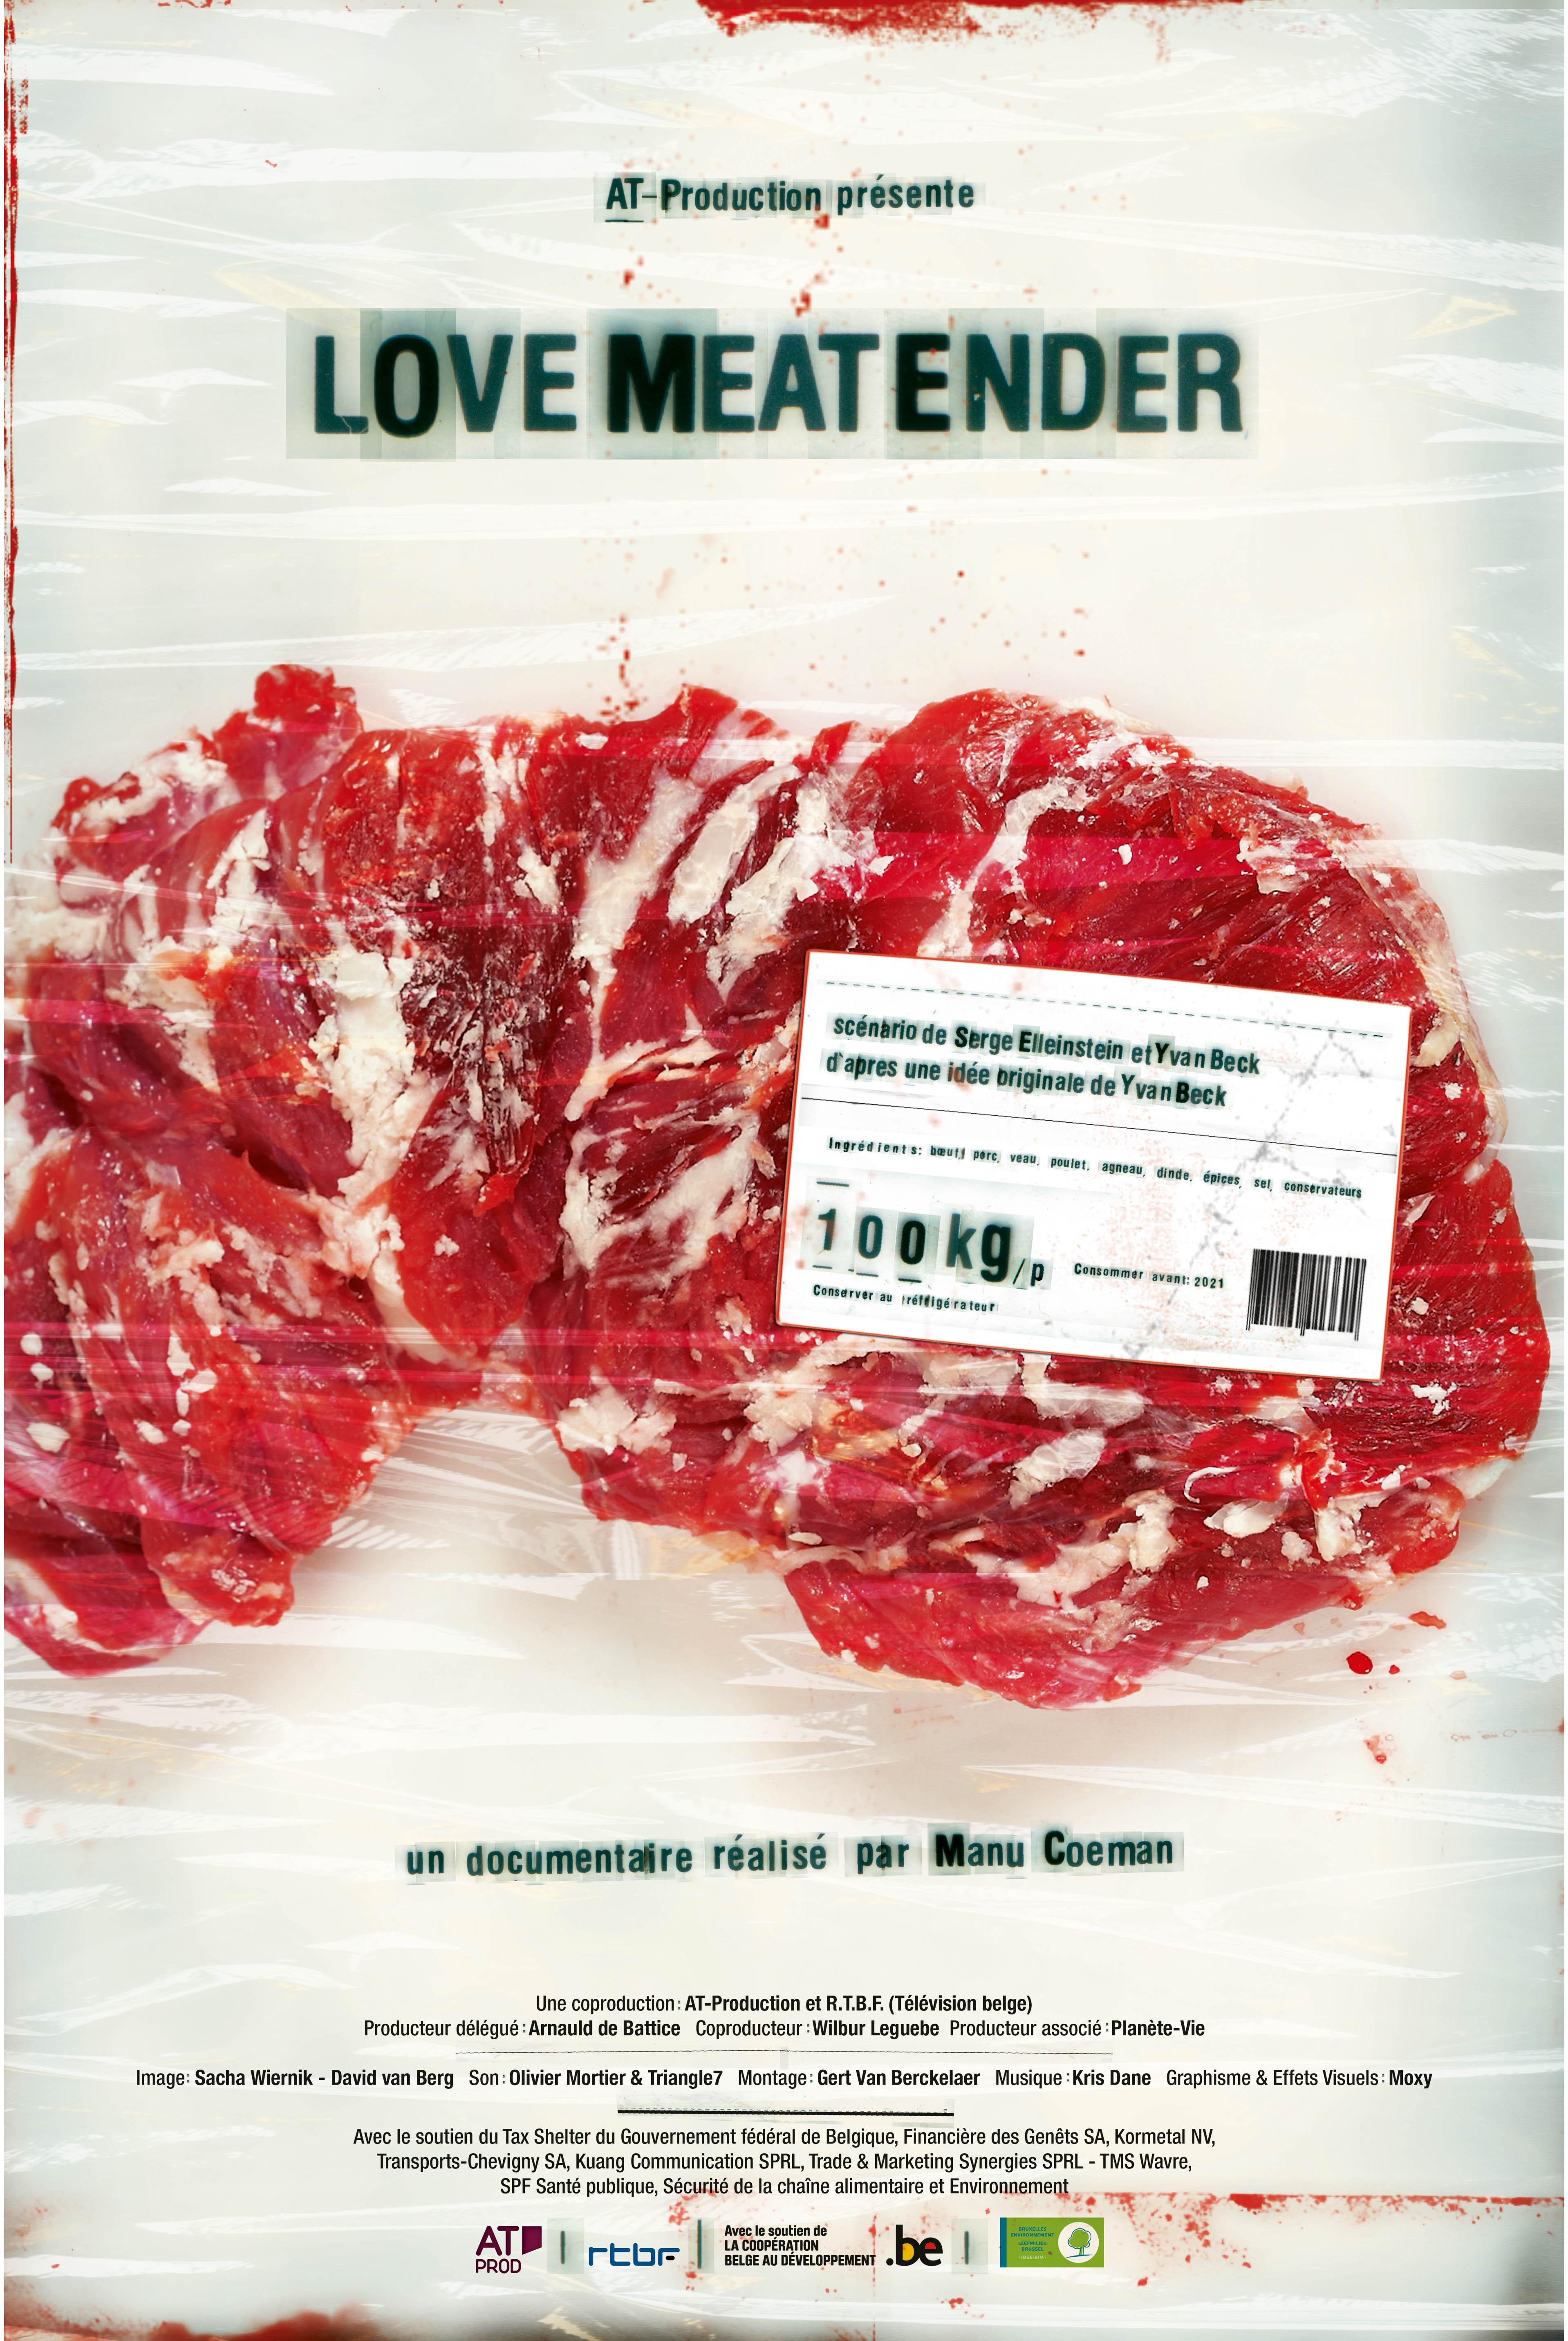 Love meatender